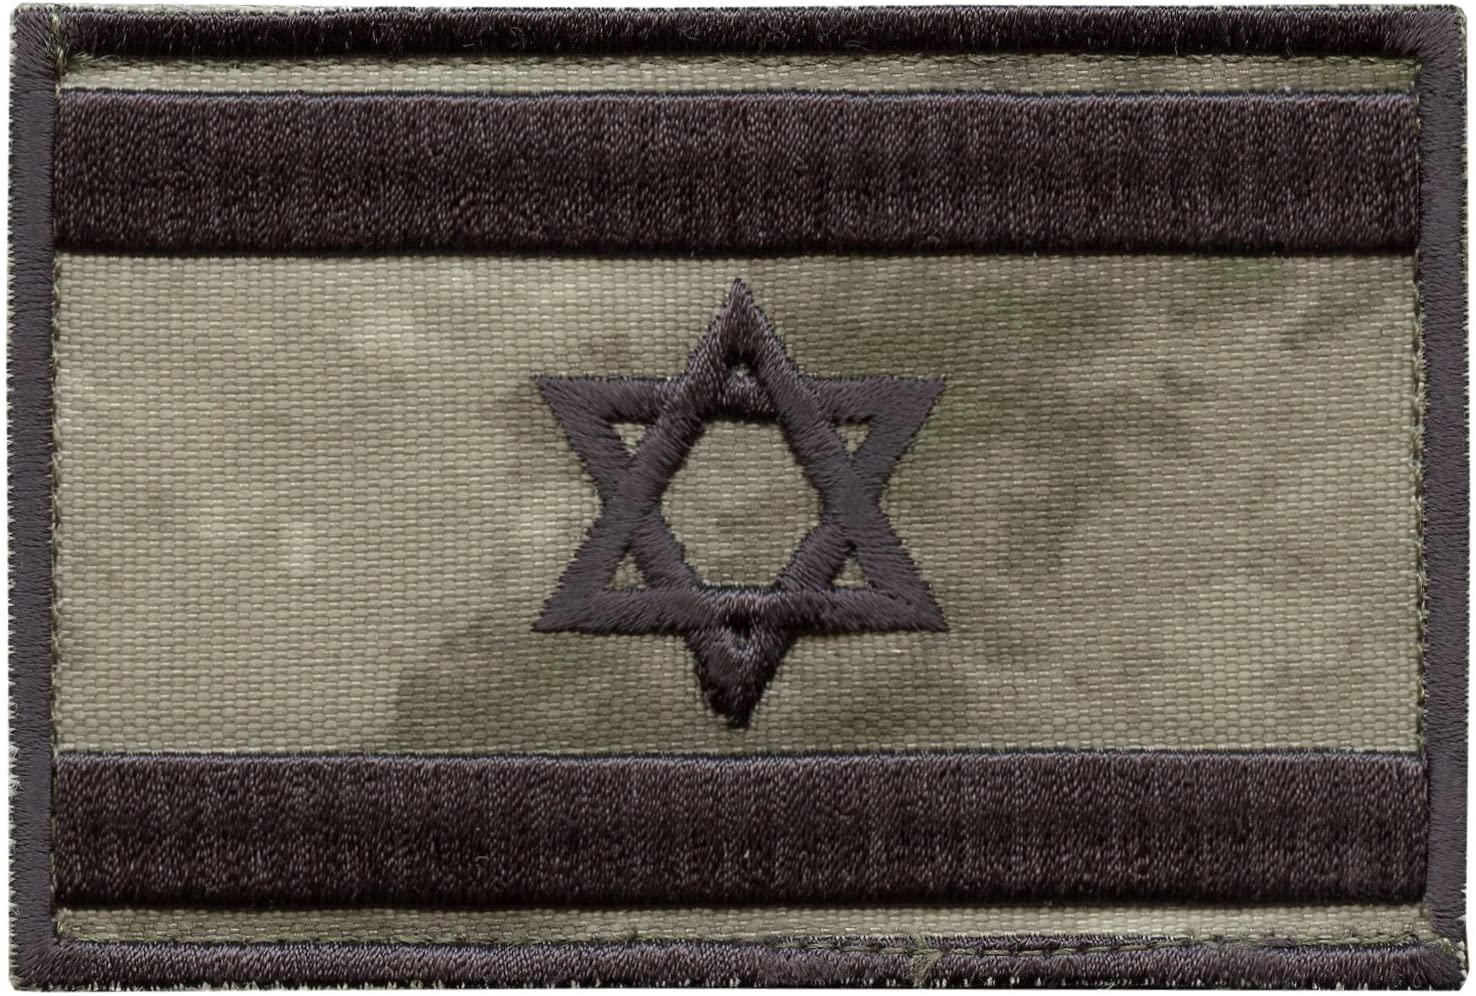 LEGEEON A-TACS AU Israel Flag IDF Arid Morale Star David Army Embroidery Sew Iron on Patch